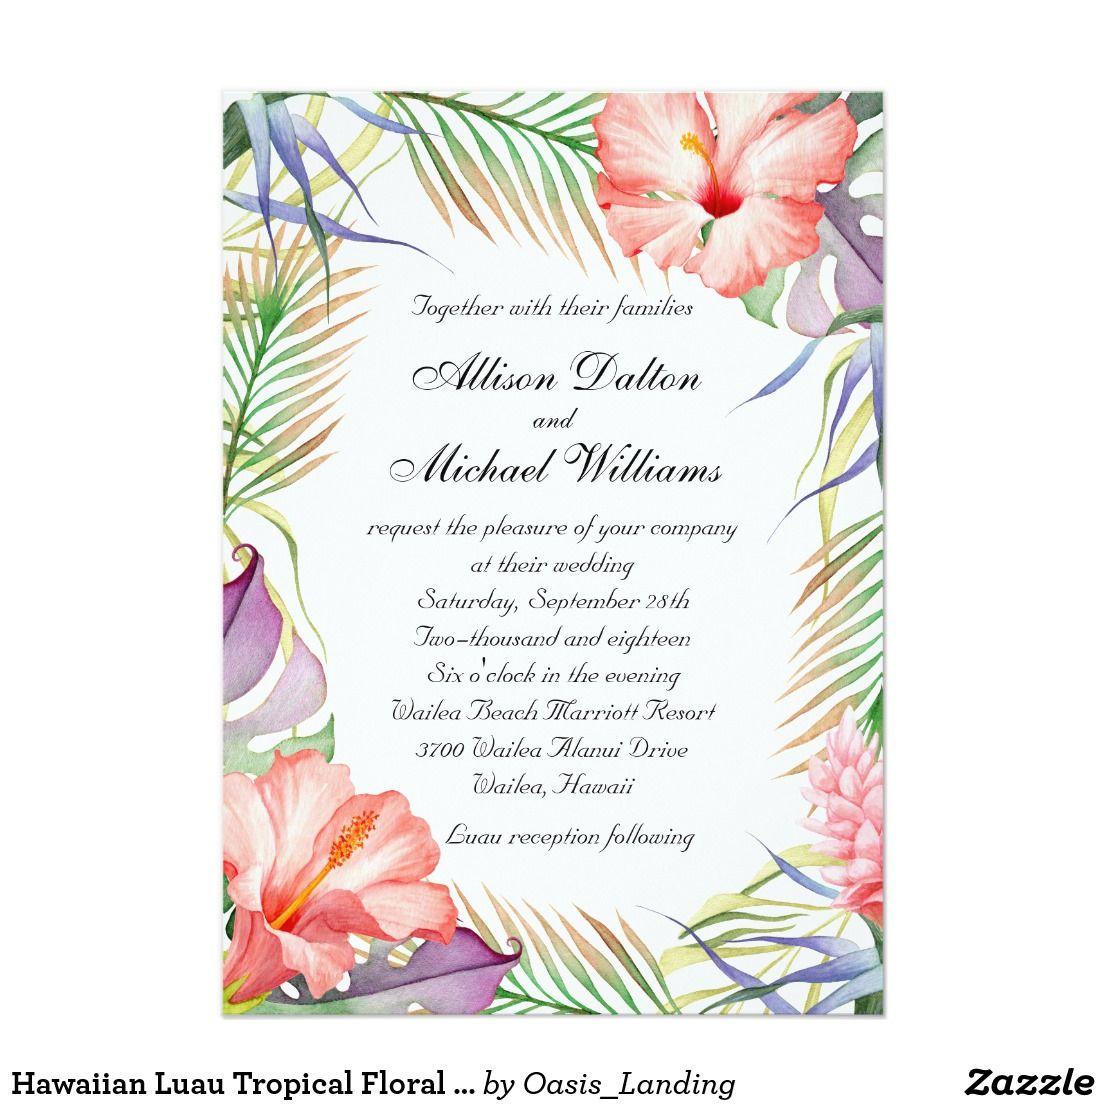 Hawaiian Luau Tropical Floral Wedding Invitation This Colorful